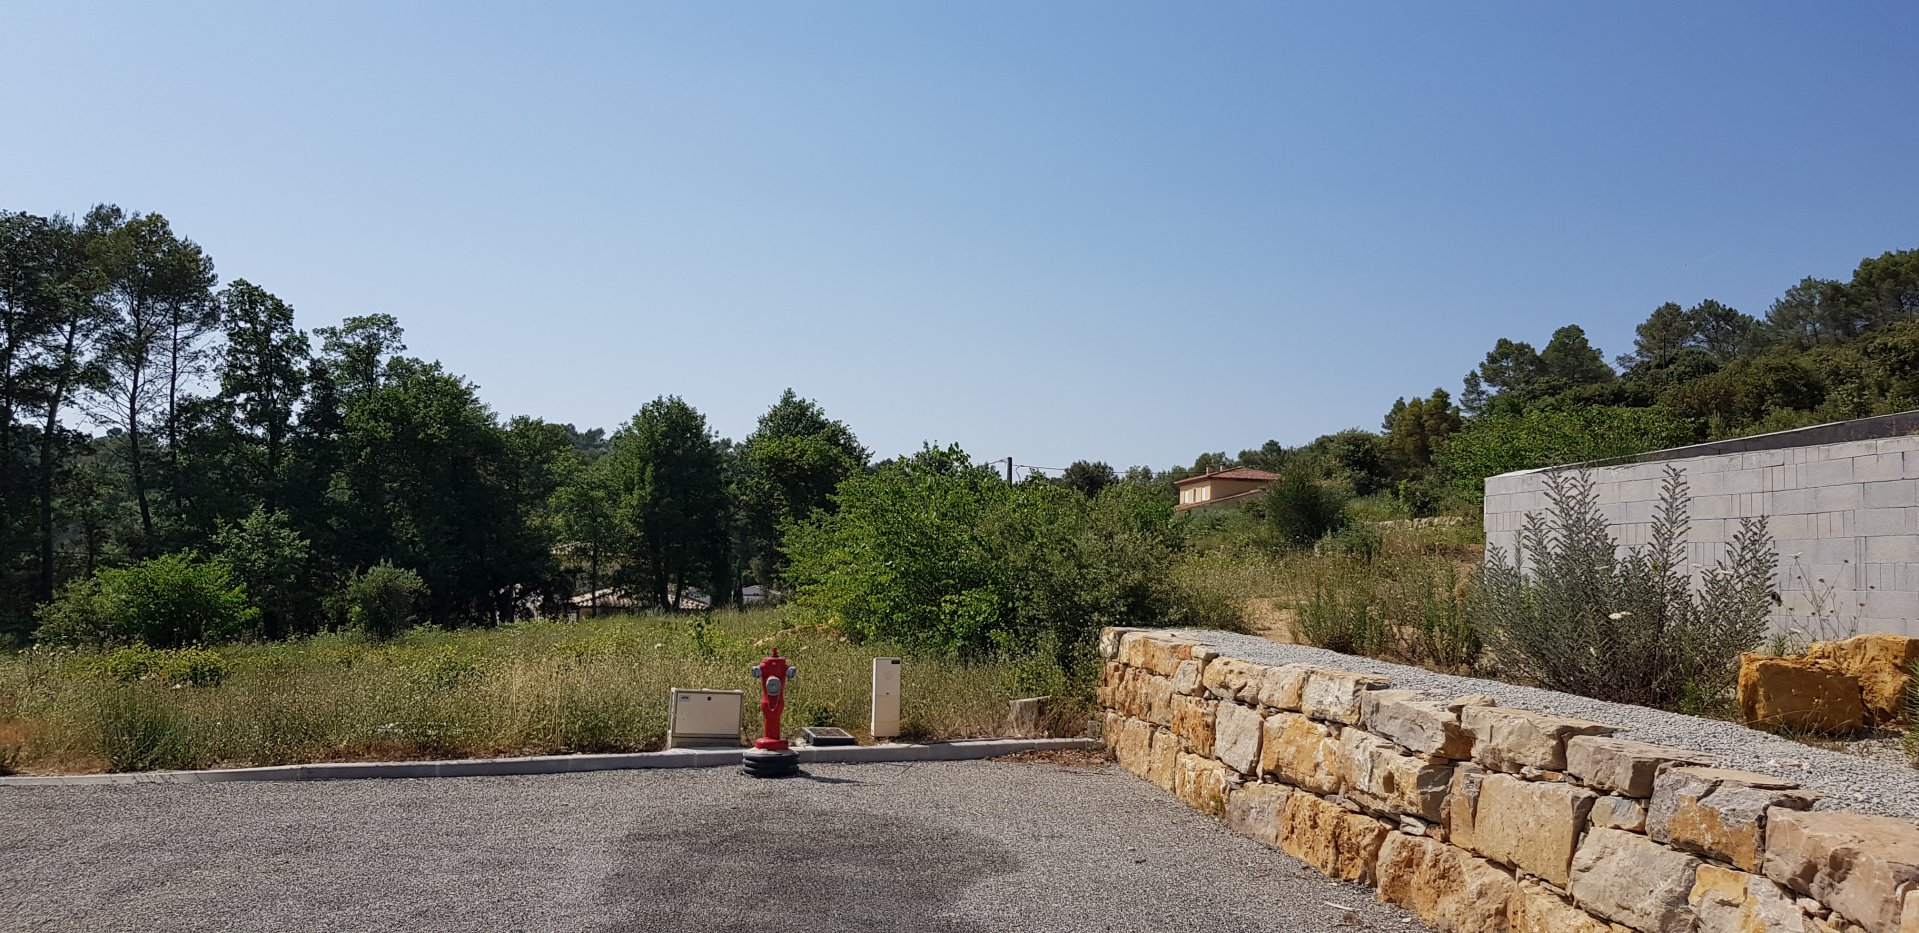 Building land - Permit granted